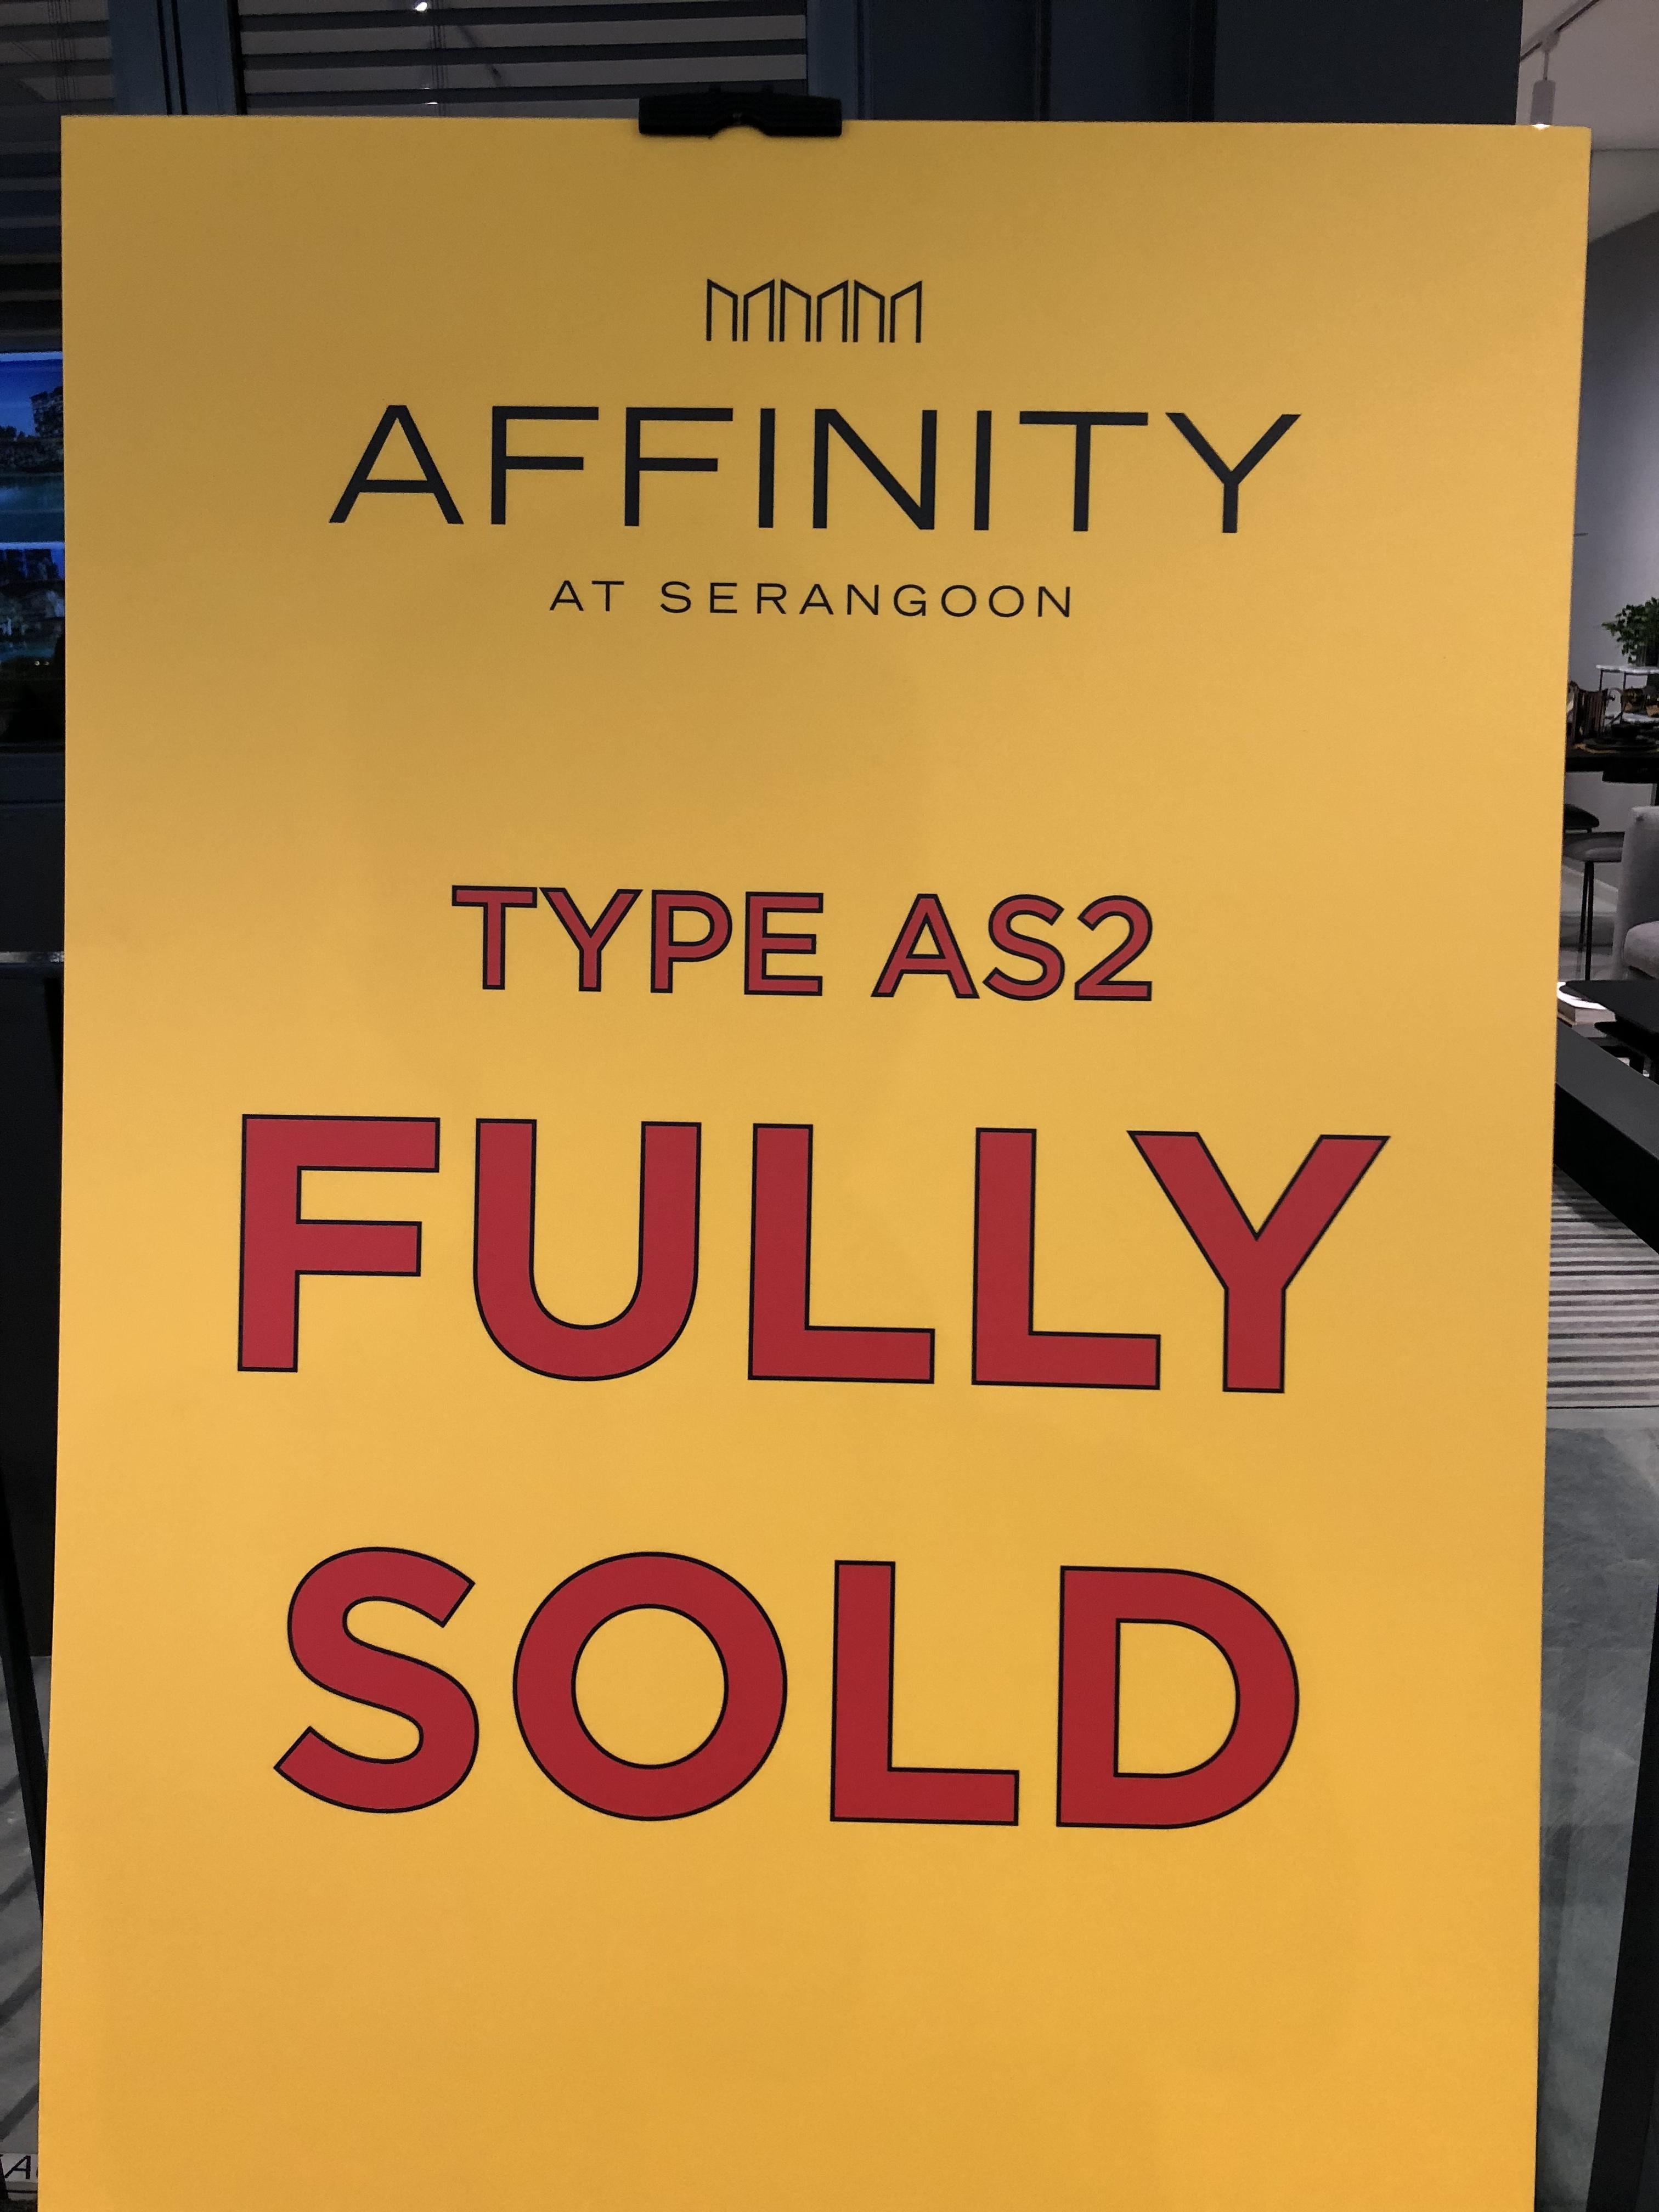 Affinity at Serangoon 新楼盘销售信息更新